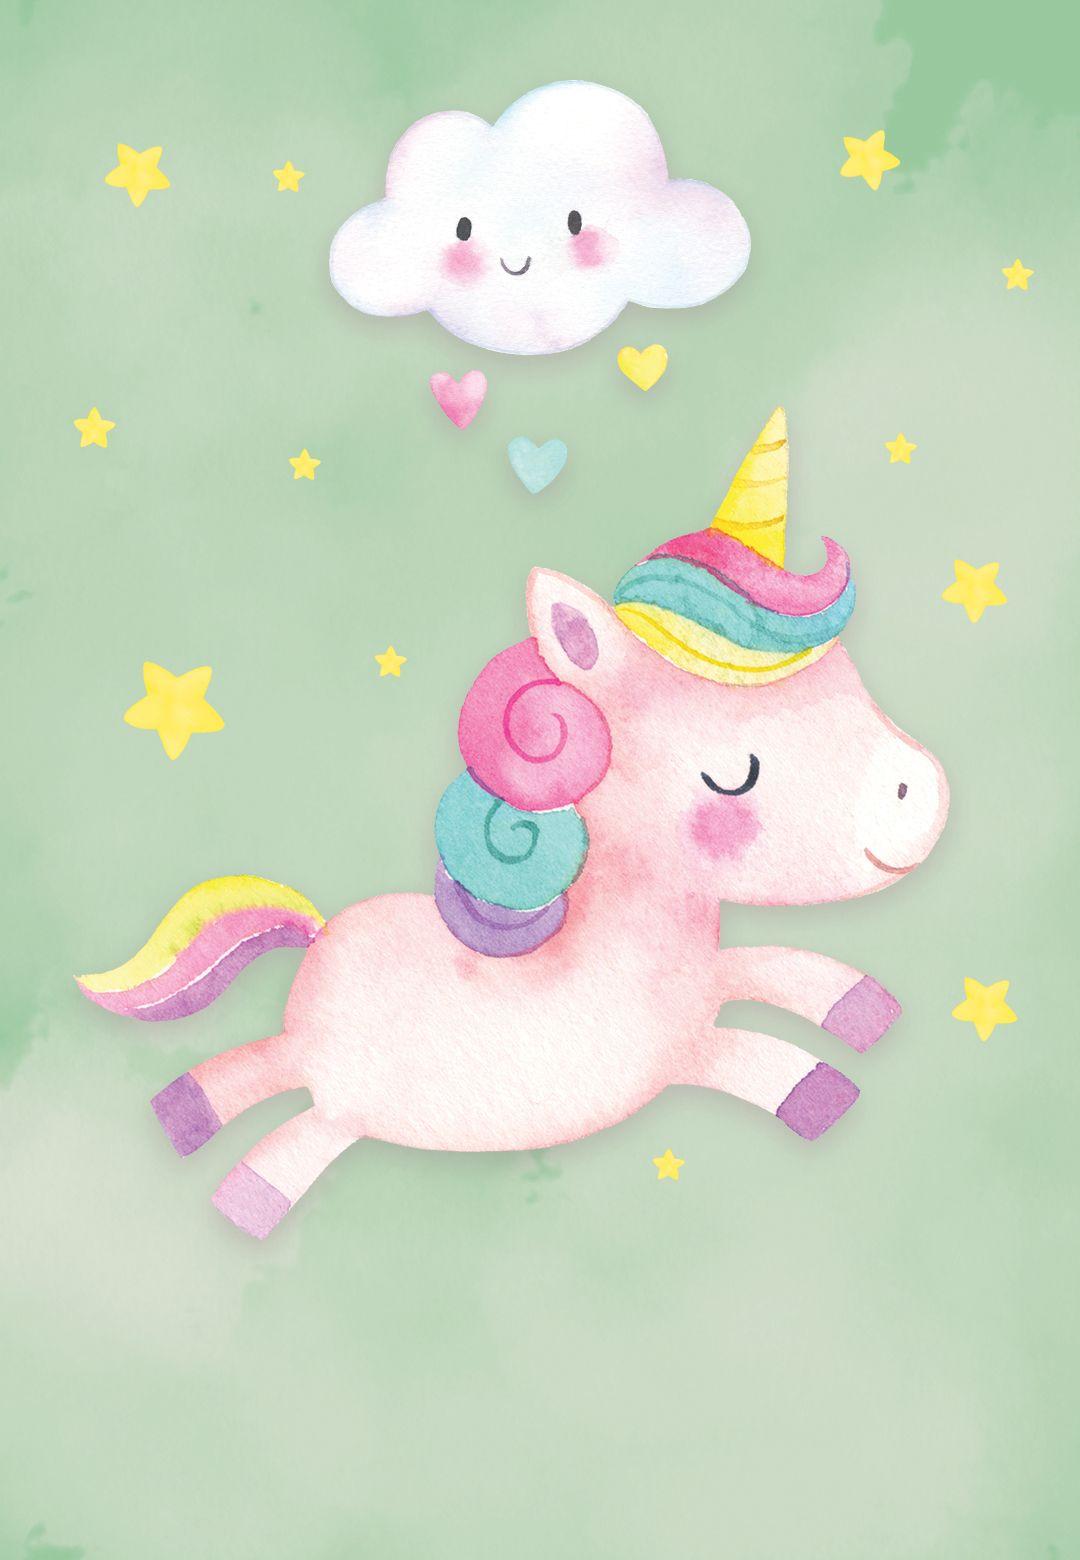 Unicorn Cheer Get Well Soon Card Greetings Island Unicorn Birthday Cards Unicorn Card Unicorn Illustration